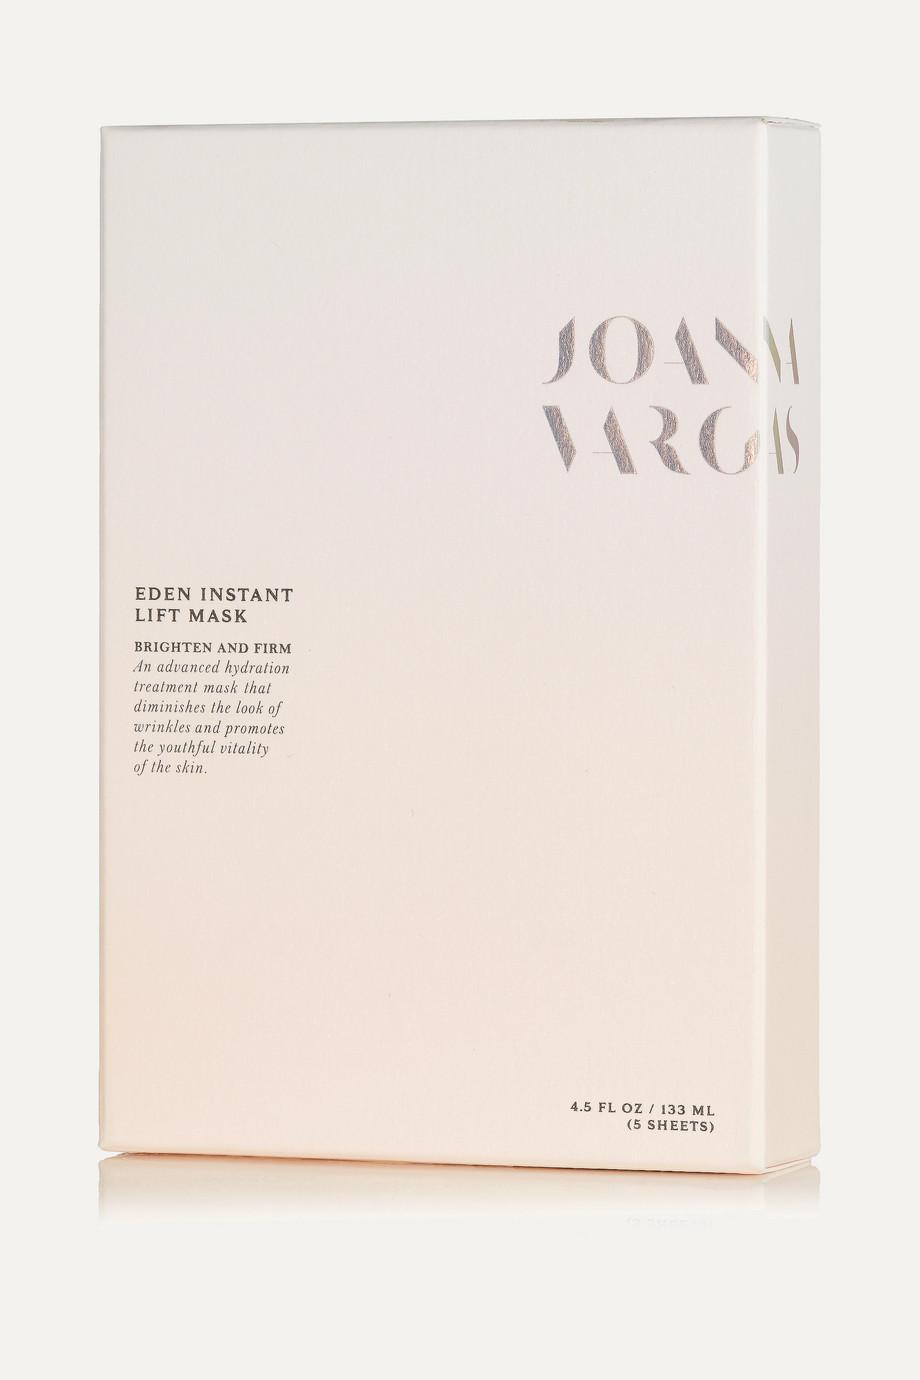 Joanna Vargas Eden Instant Lift Mask – 5 Gesichtsmasken